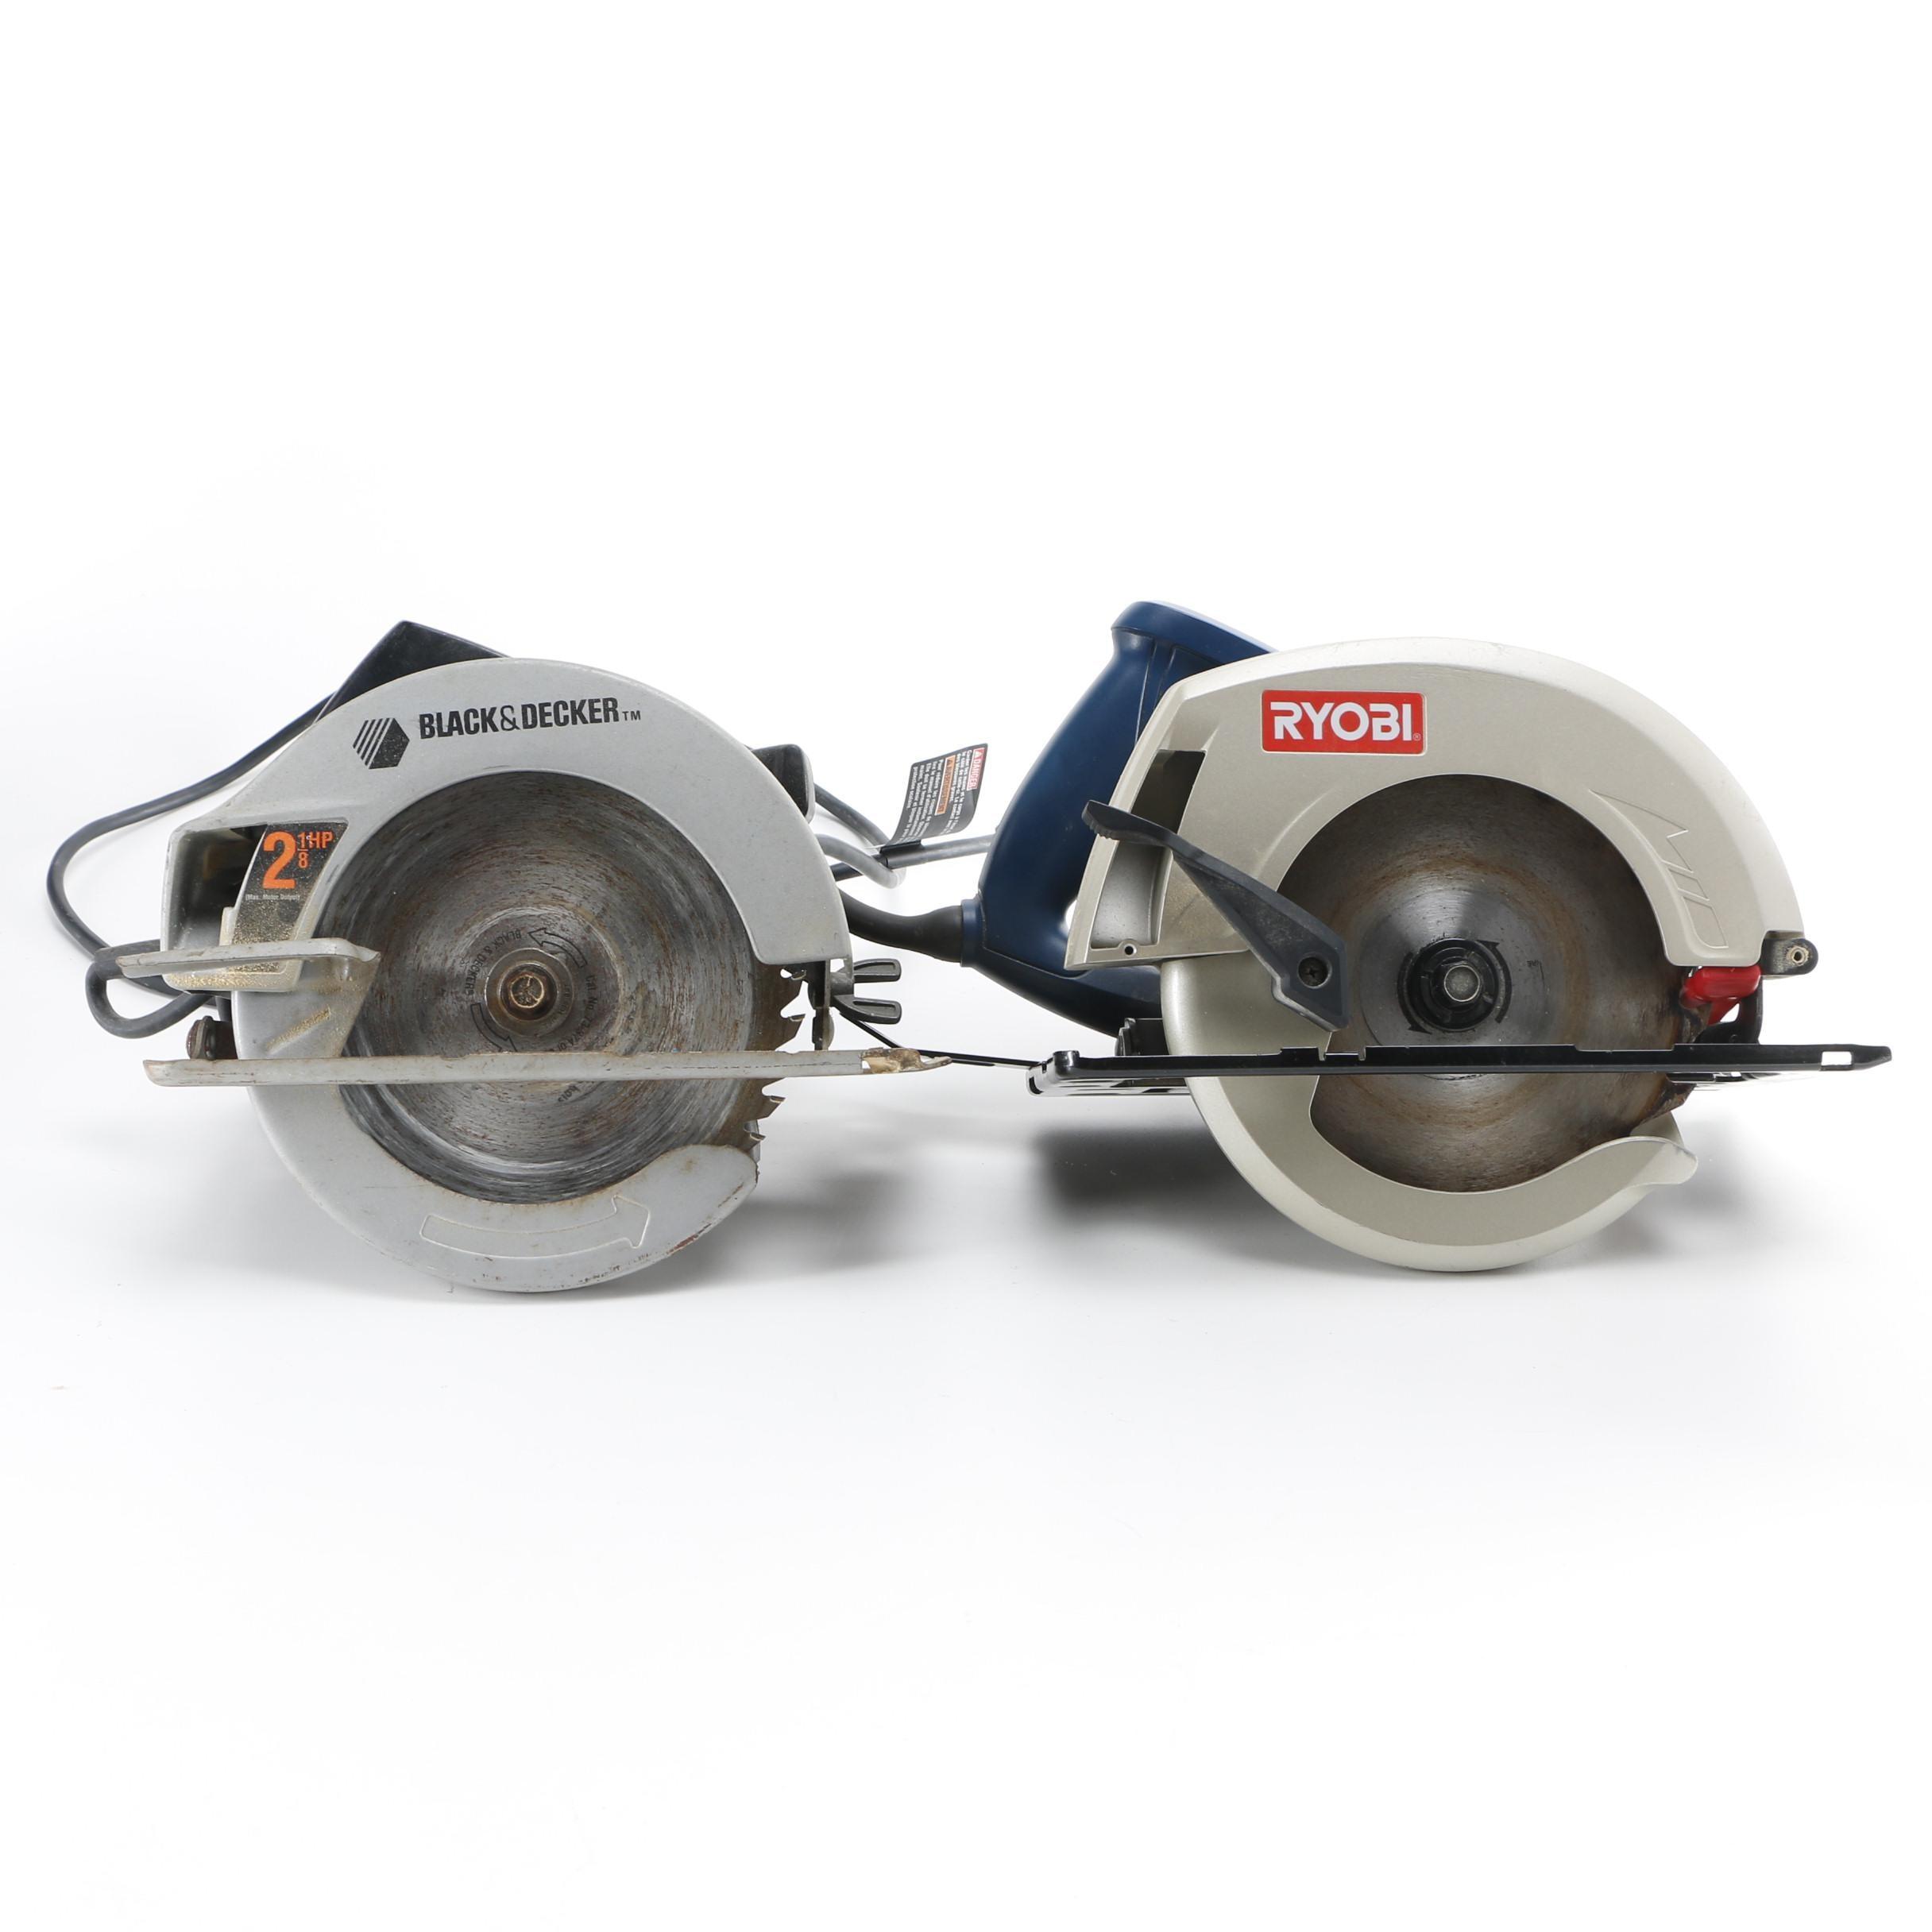 Electric Circular Saws Including Black & Decker and Ryobi